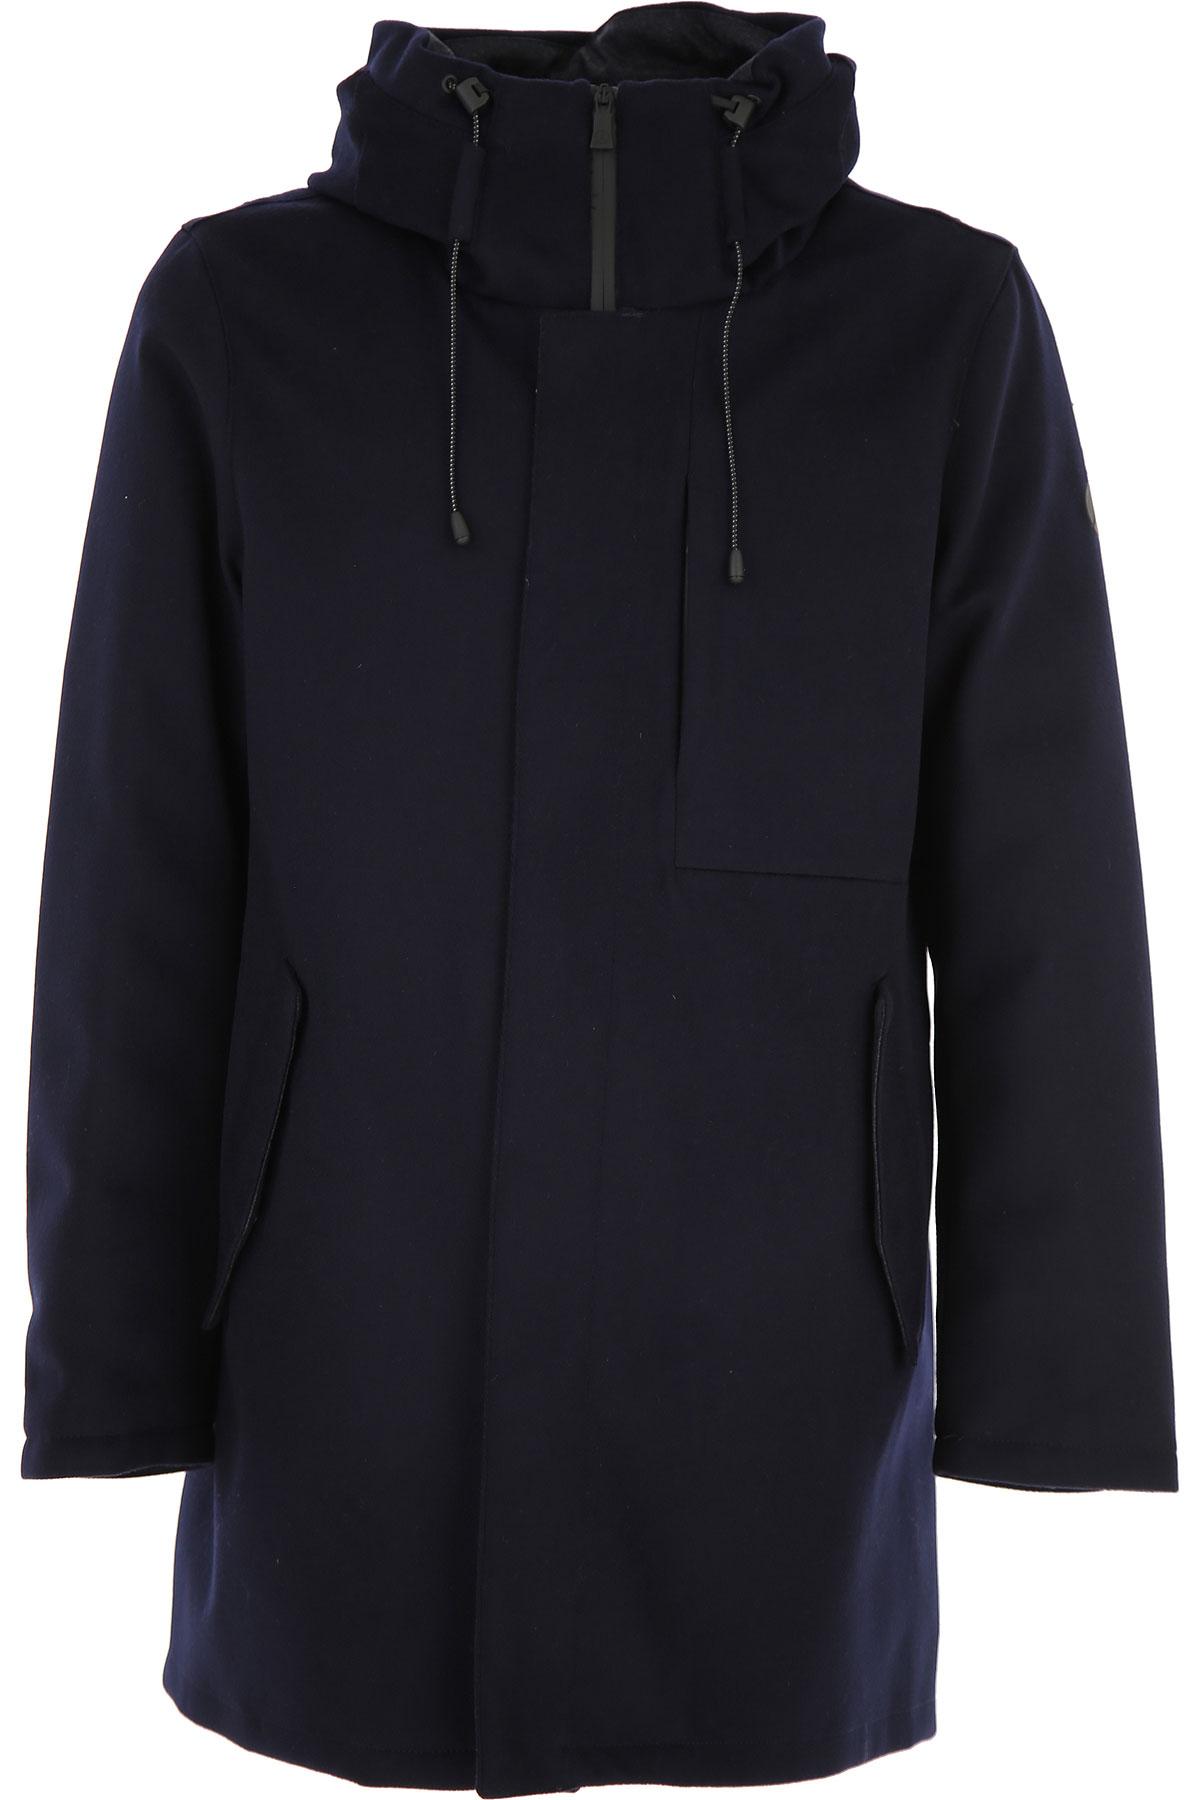 People of Shibuya Jacket for Men On Sale, Blue, Wool, 2019, M XL XXL